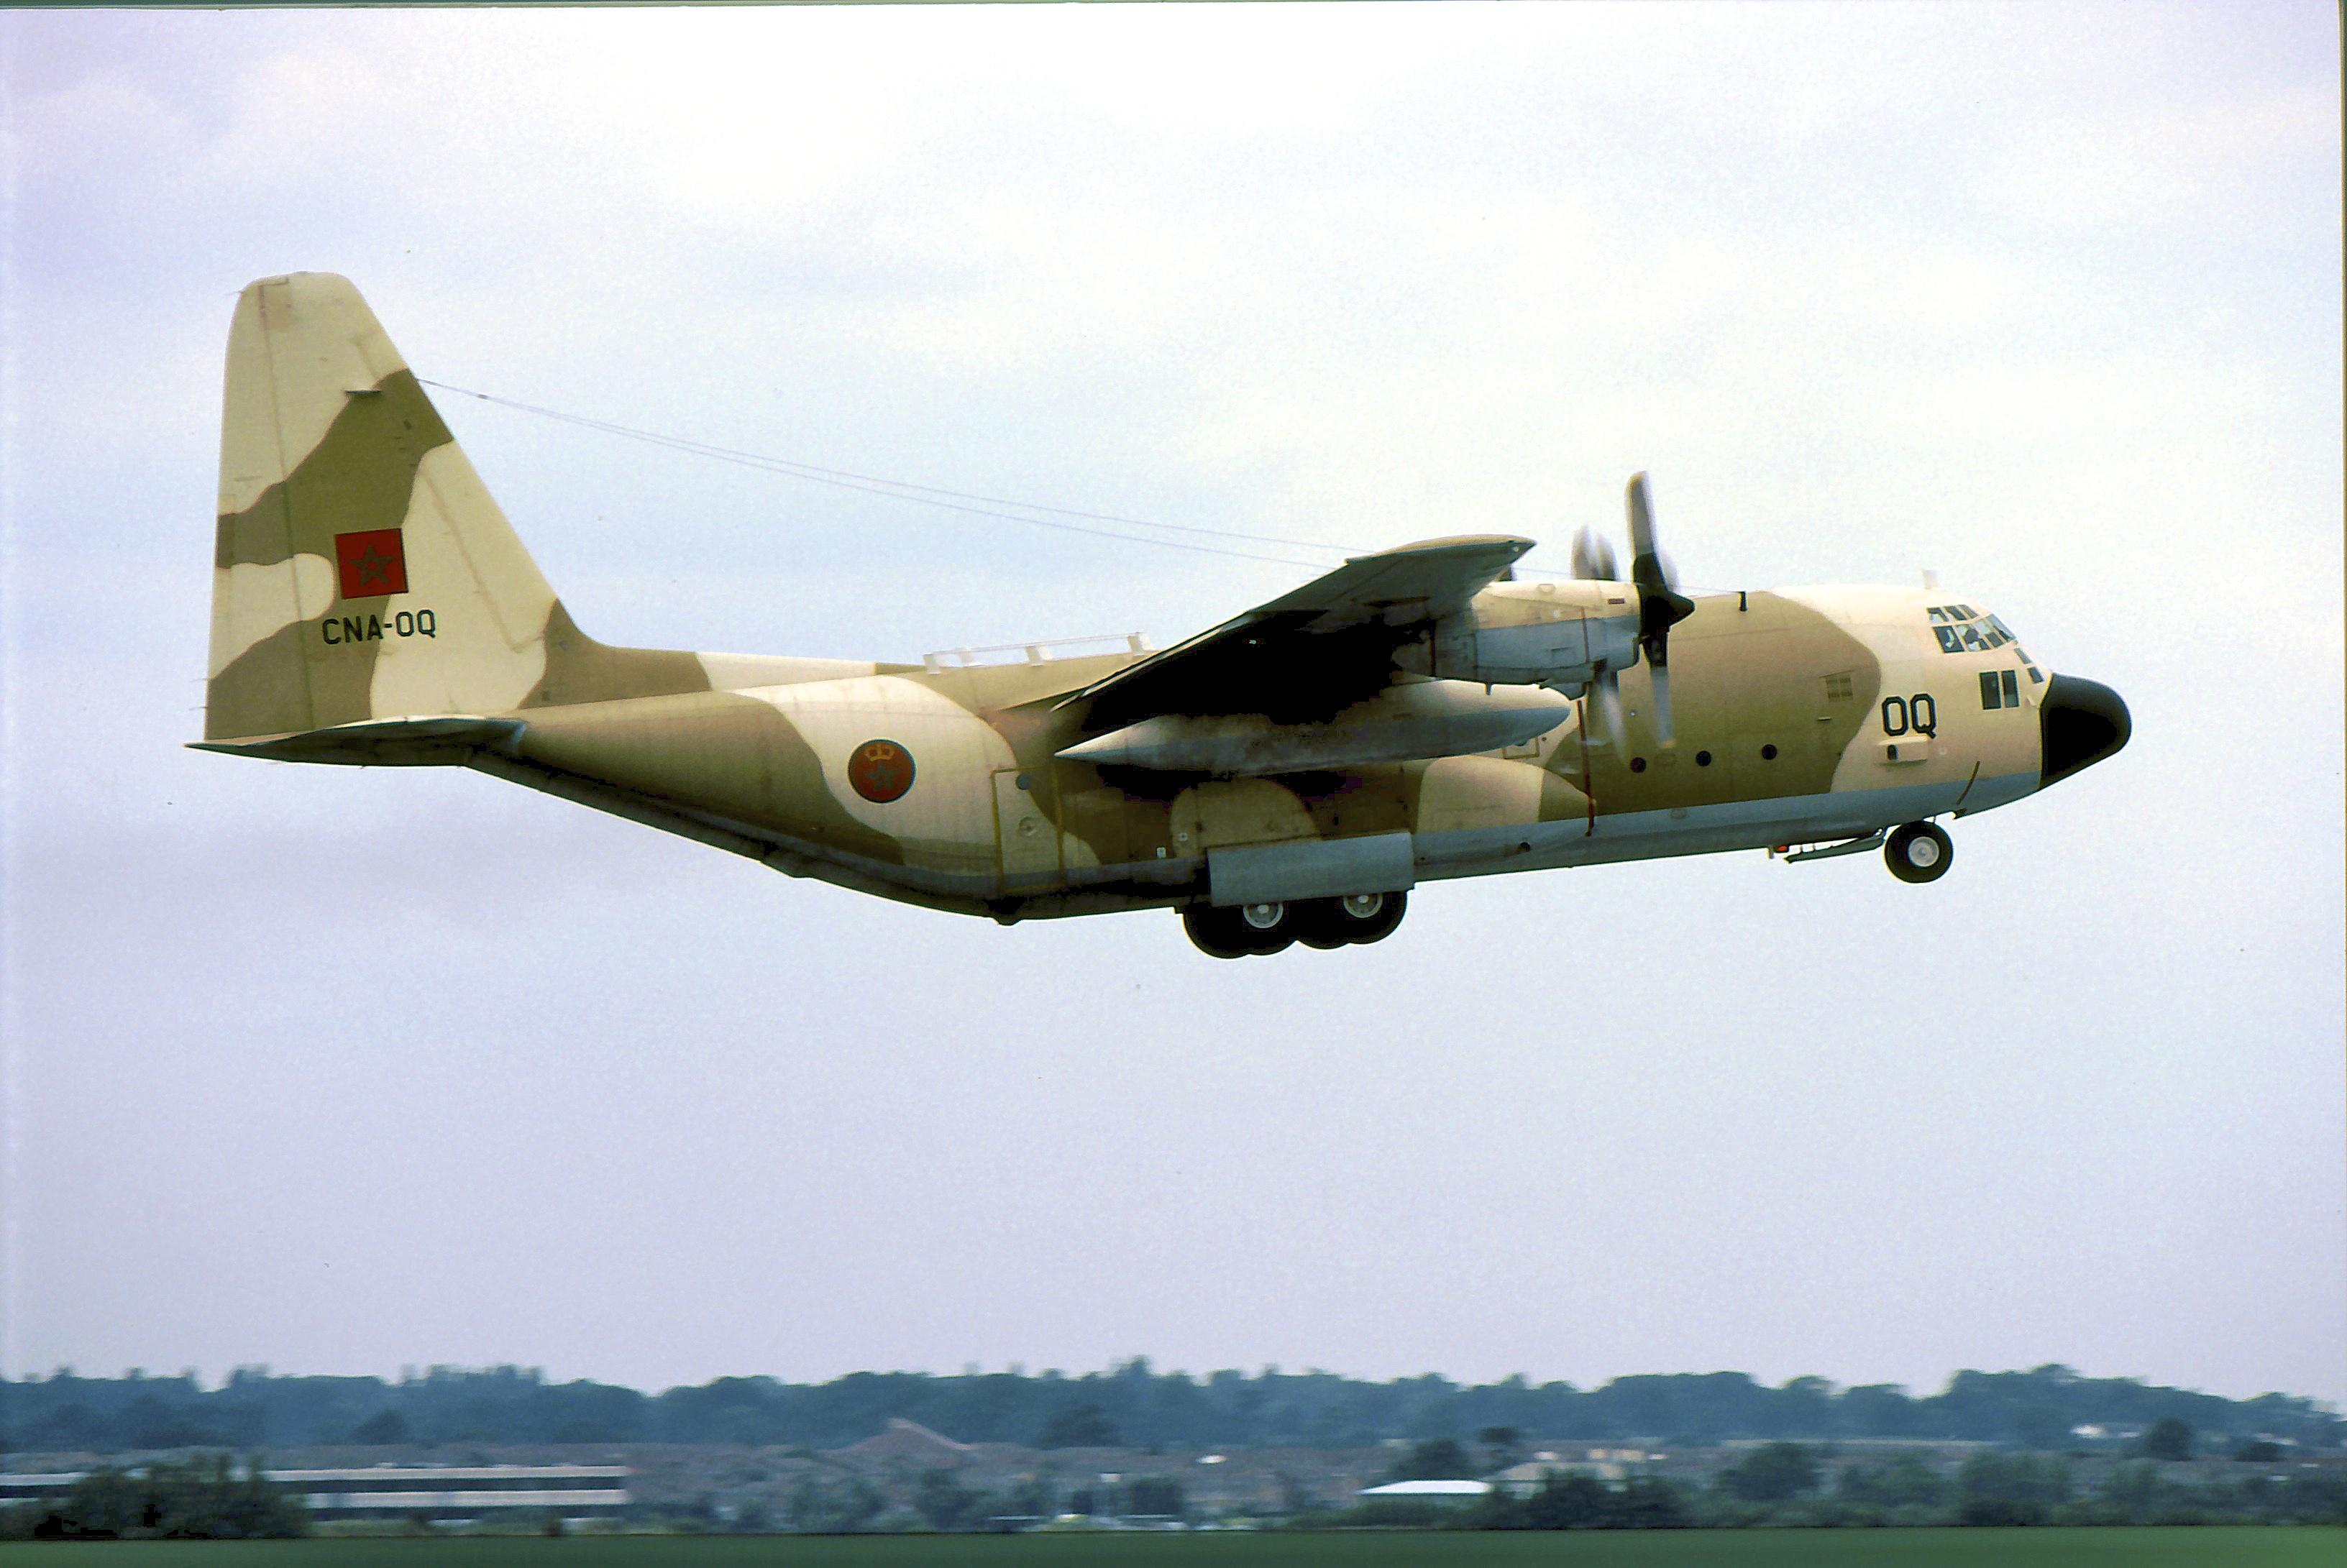 FRA: Photos anciens avions des FRA - Page 5 8001164733_0dbfab2420_o